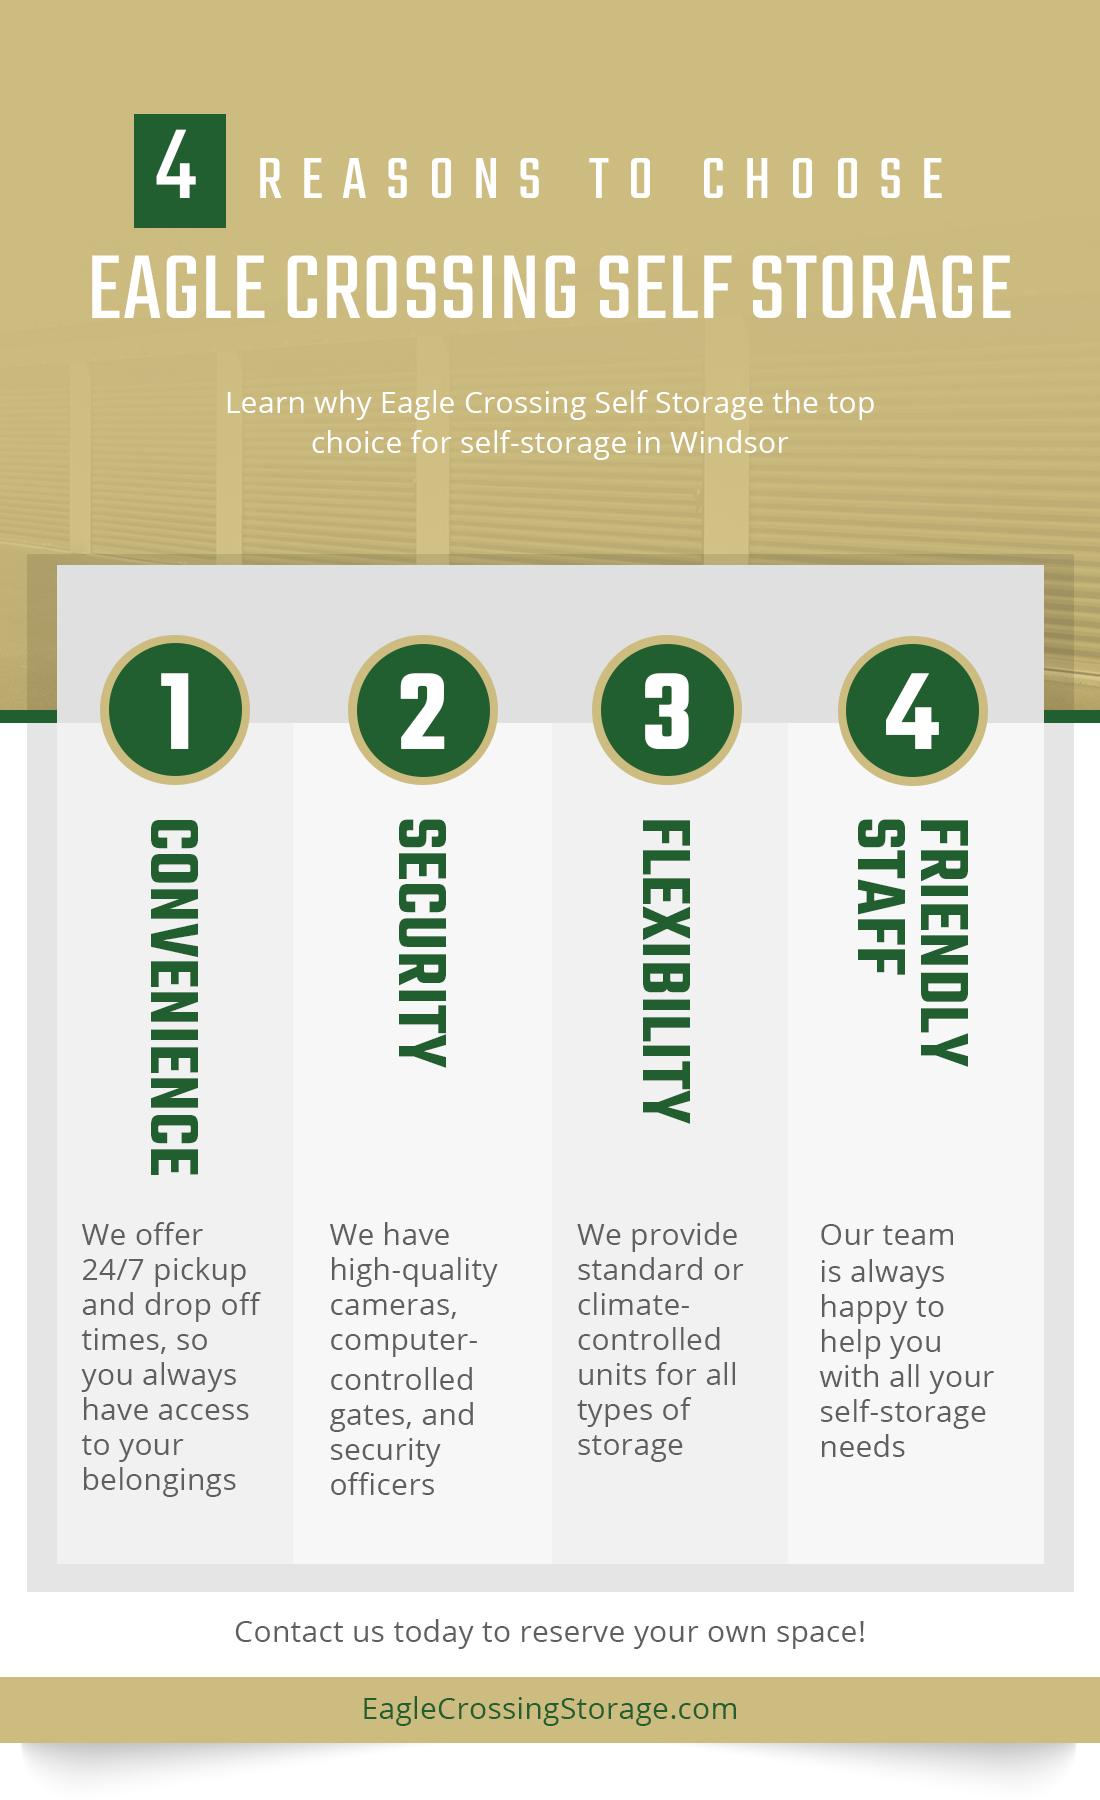 4 Reasons To Choose Eagle Crossing Self Storage